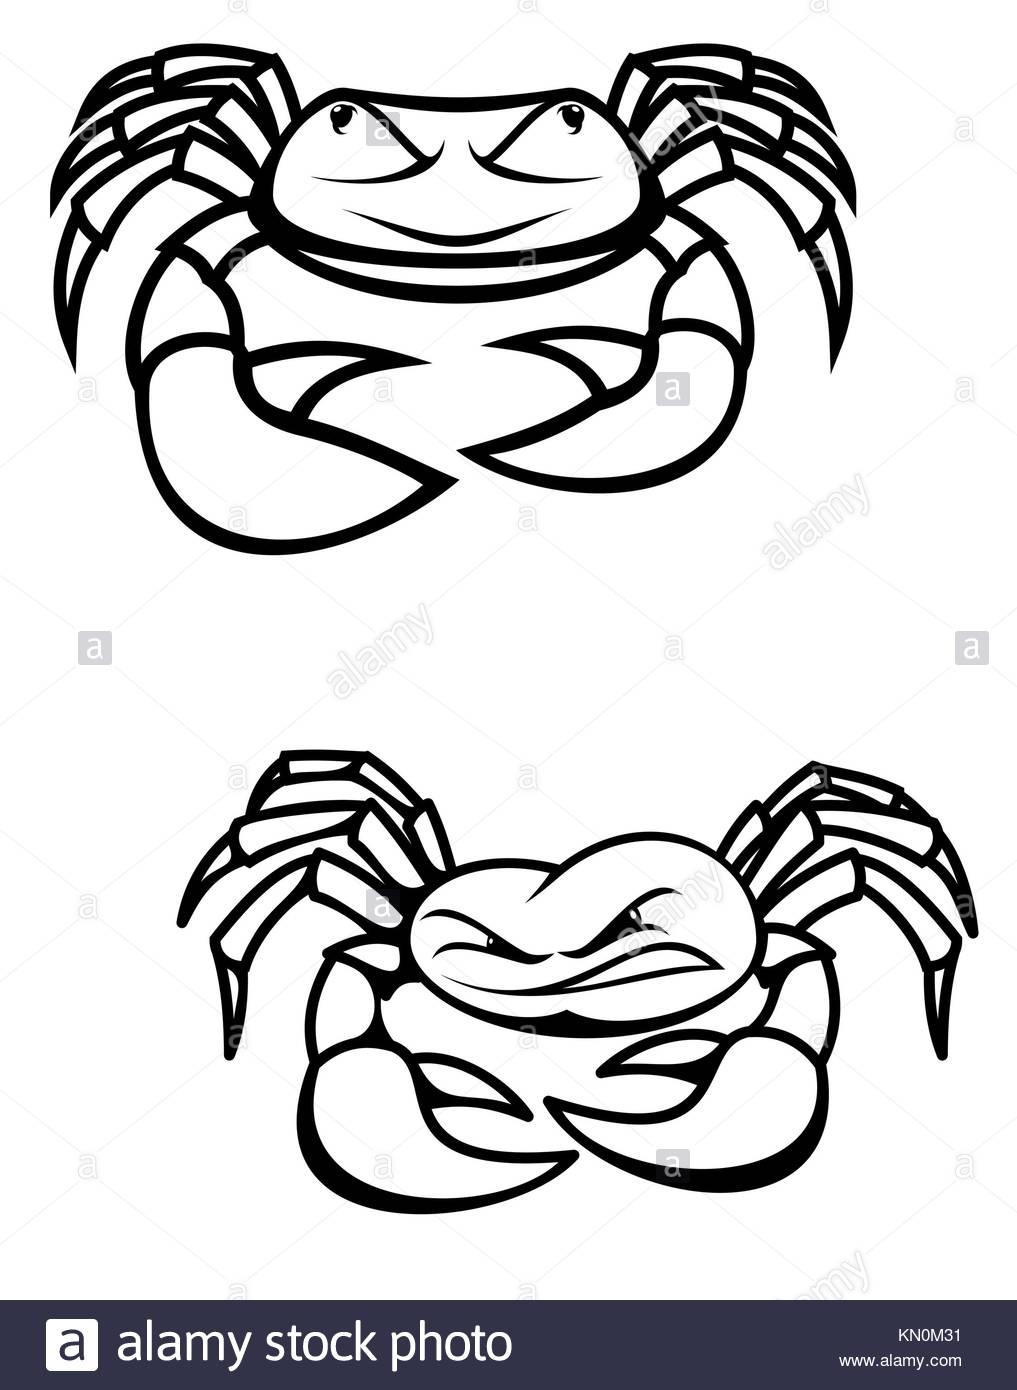 Cute Crab Cartoon Stockfotos & Cute Crab Cartoon Bilder - Seite 3 ...